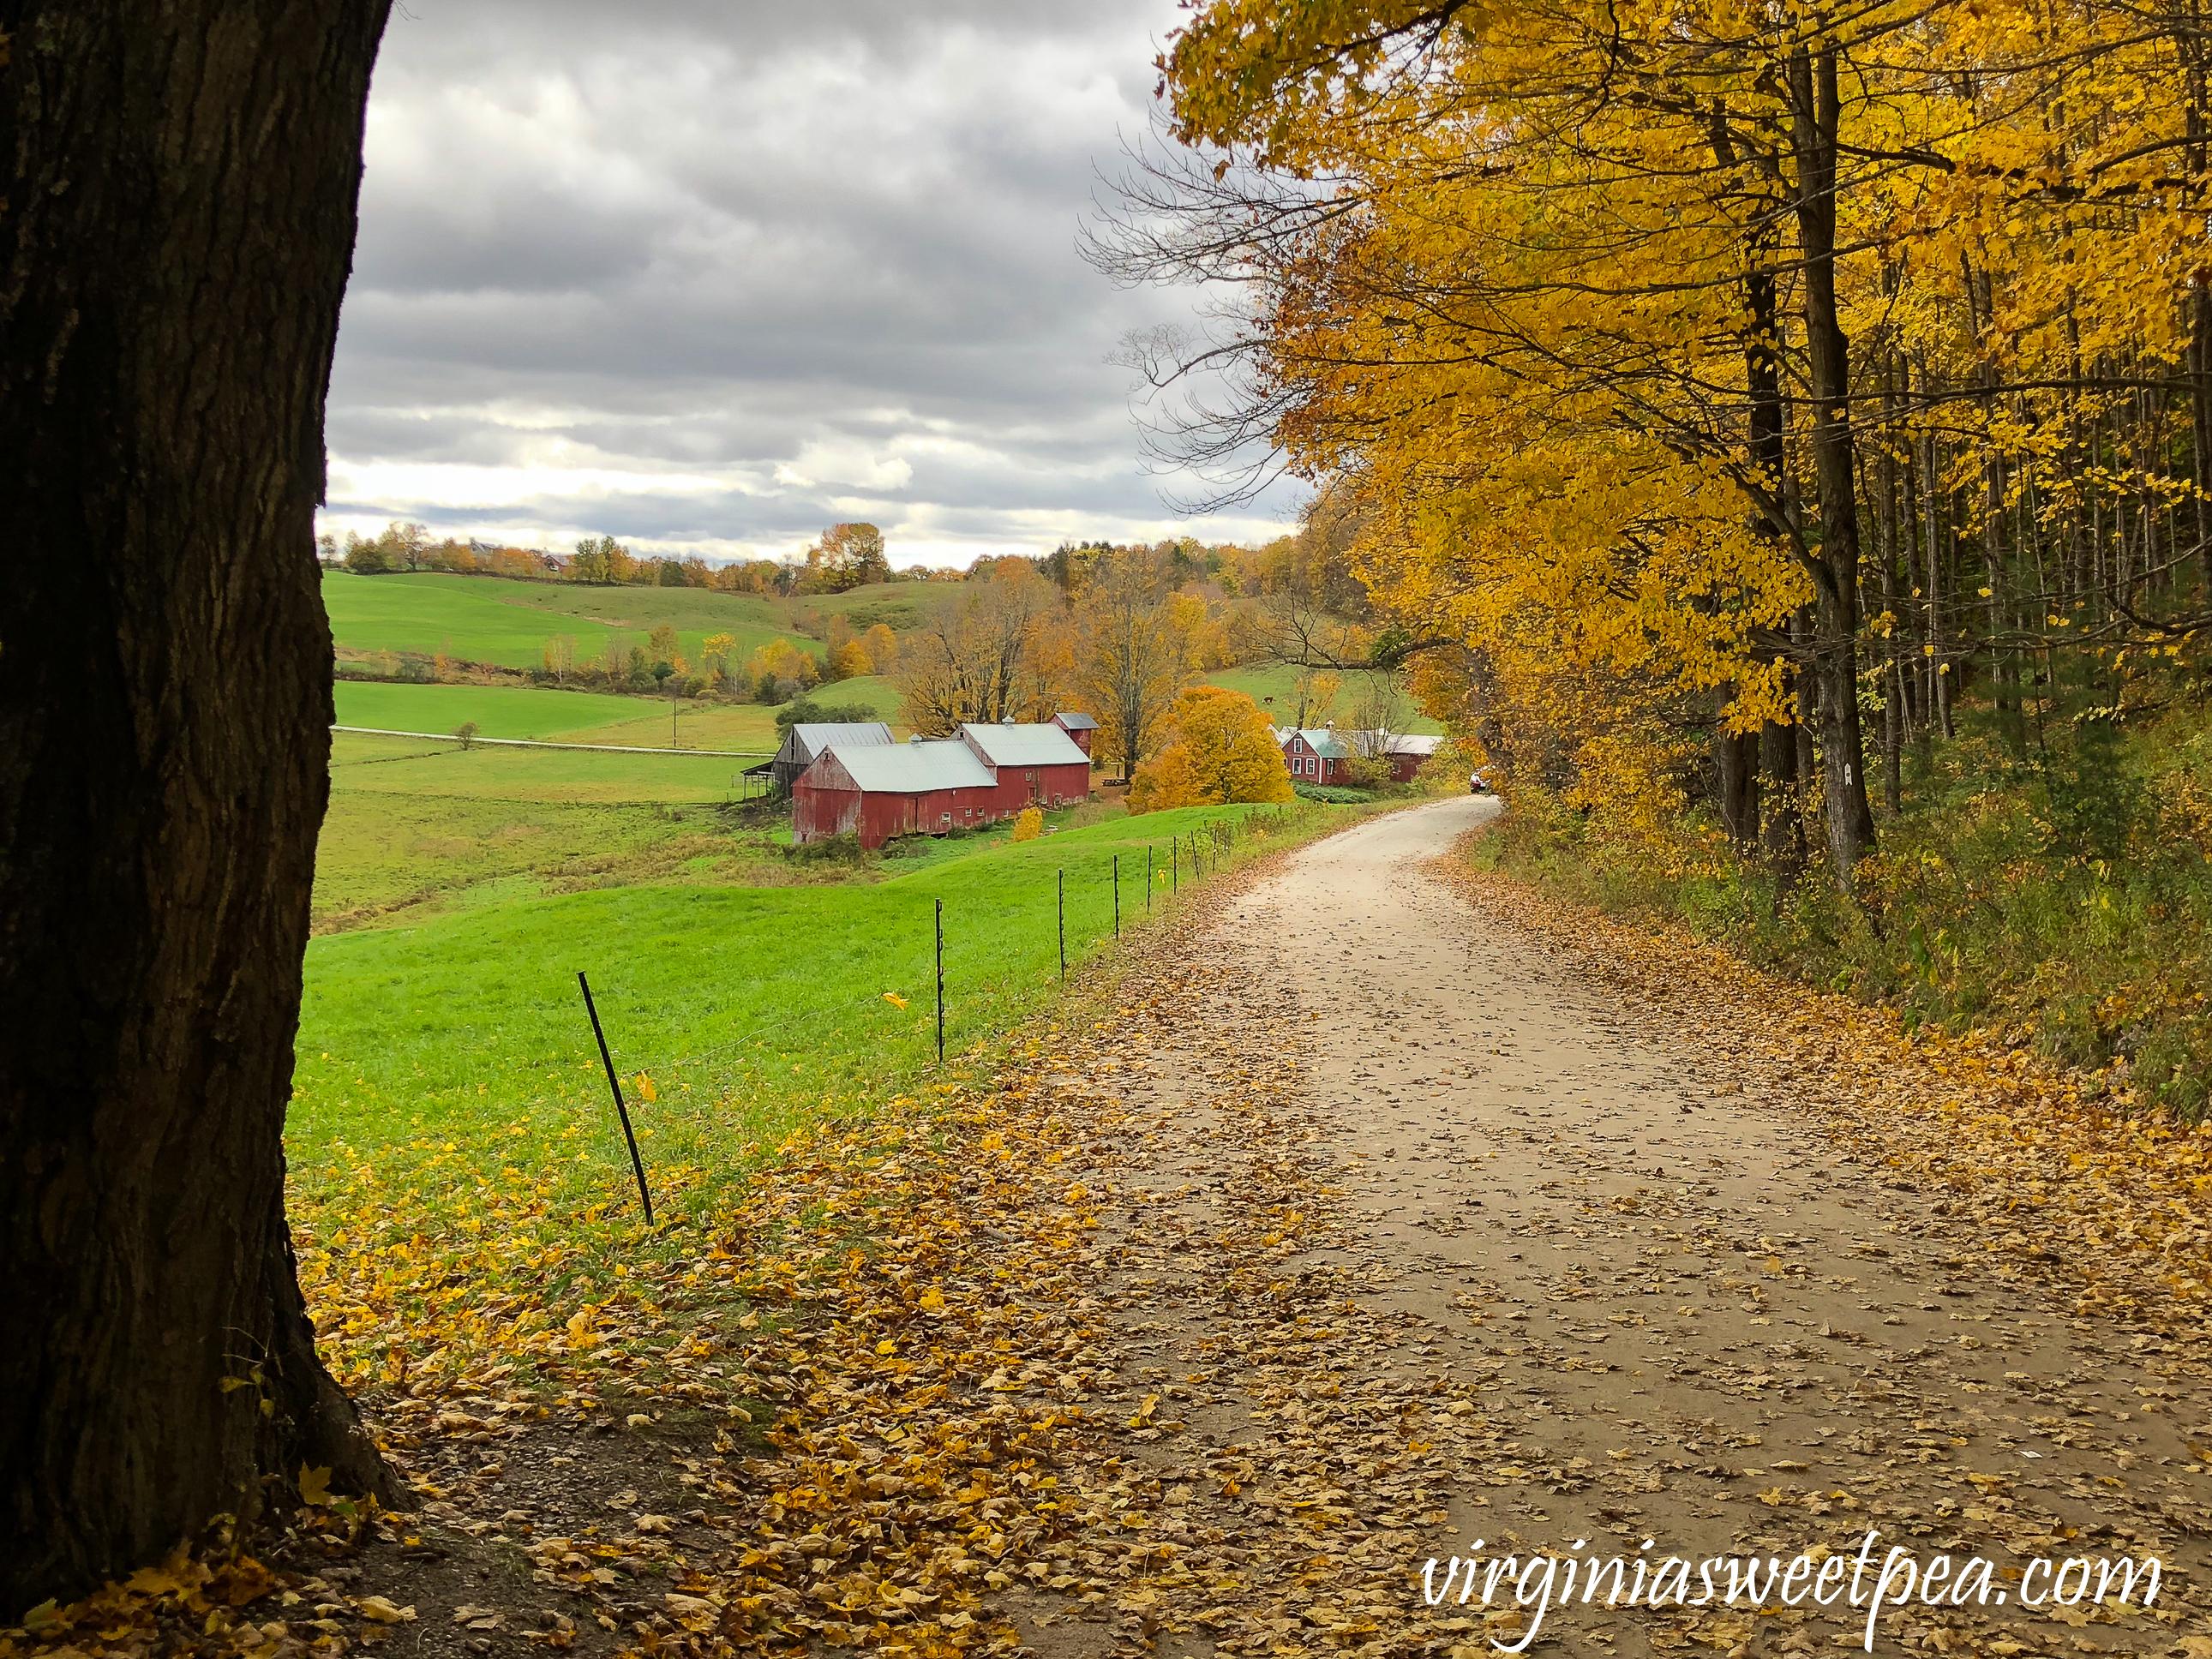 The Jenny Farm in Vermont #vermont #fallinvermont #fall